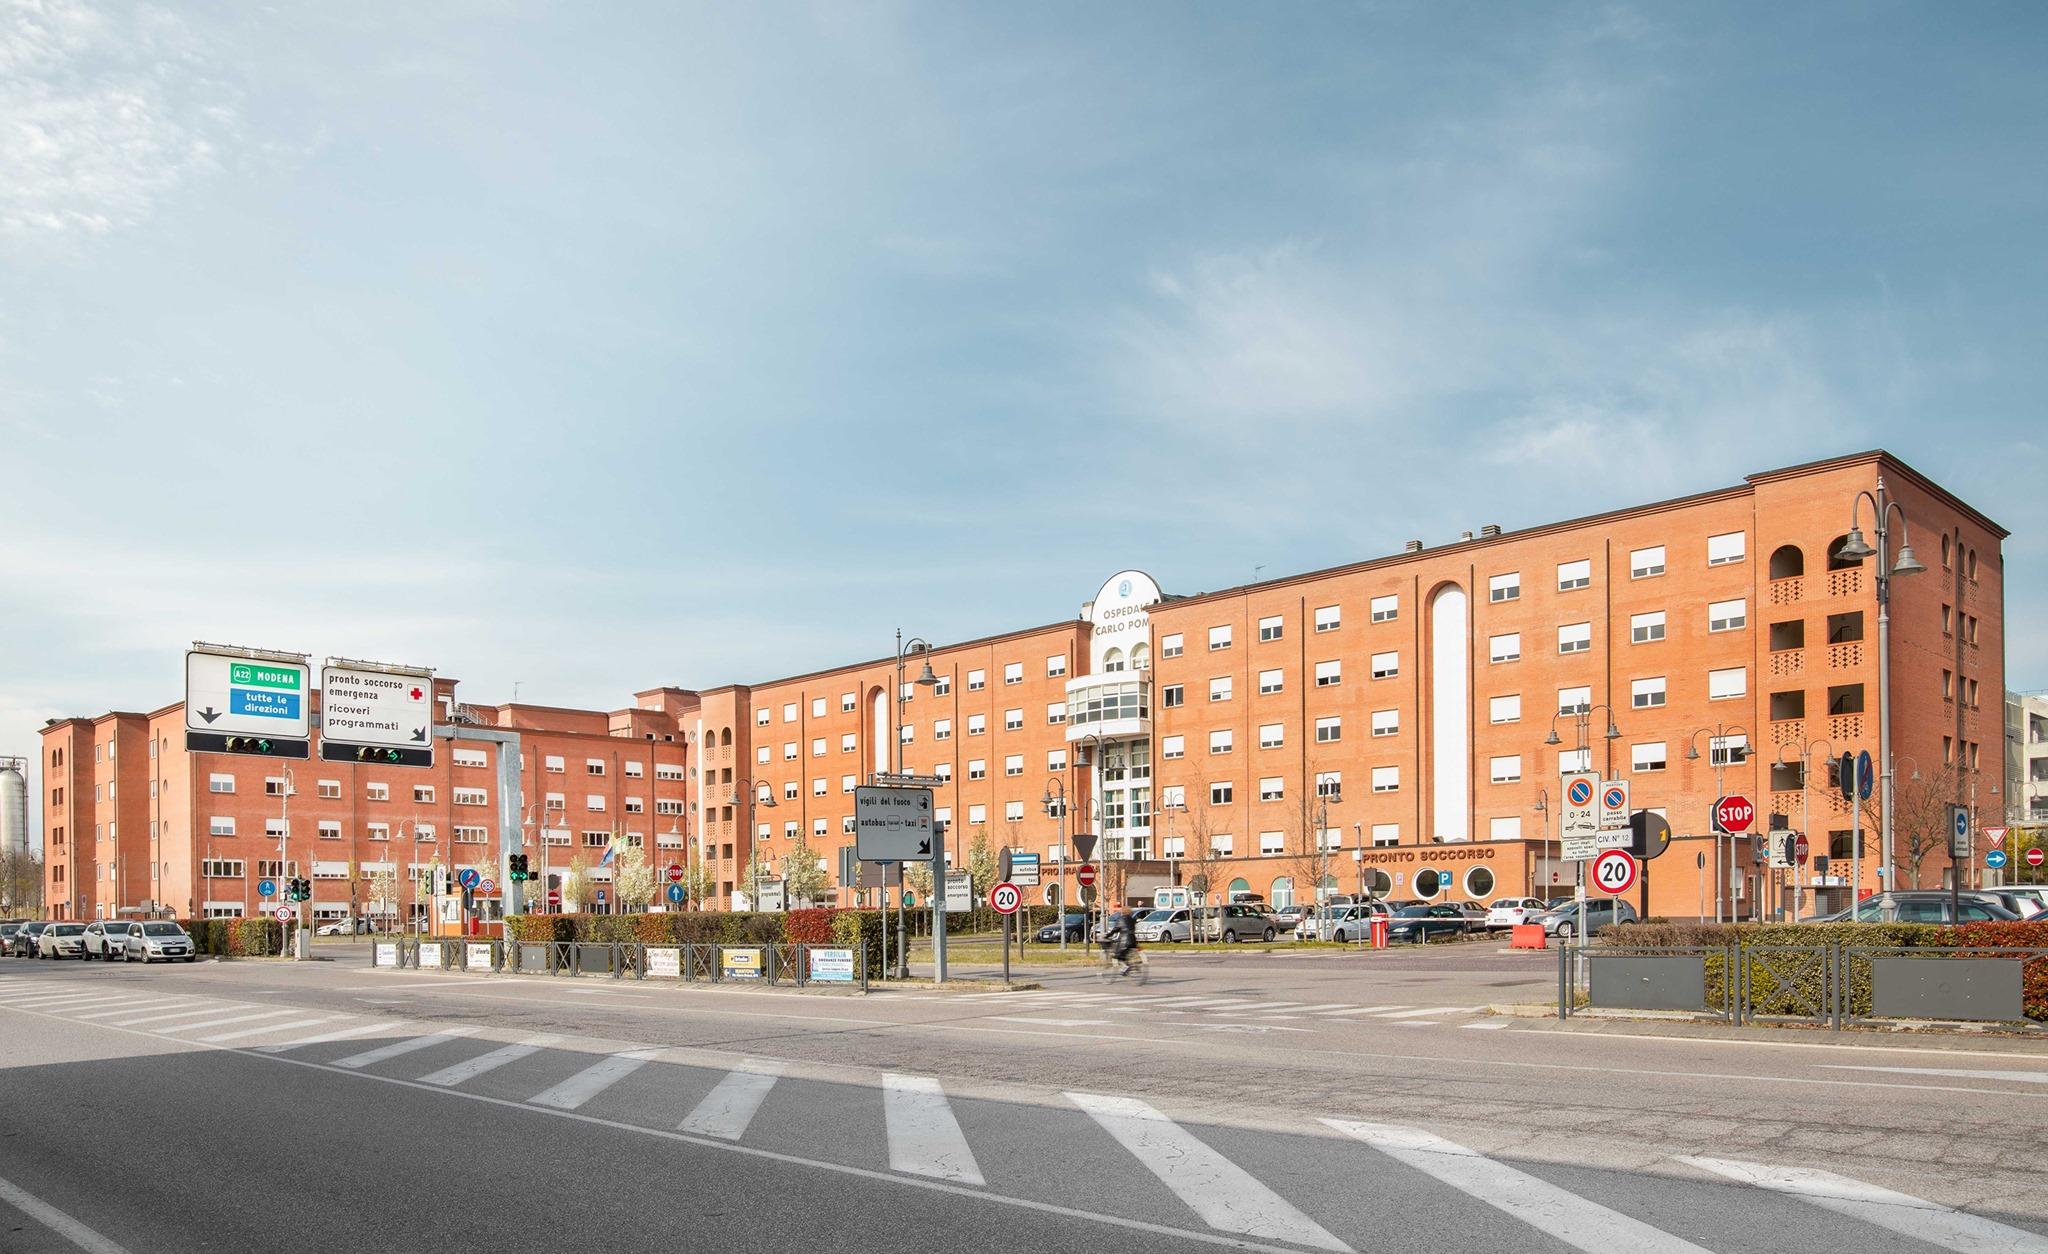 Raccolta fondi per l'Ospedale di Mantova